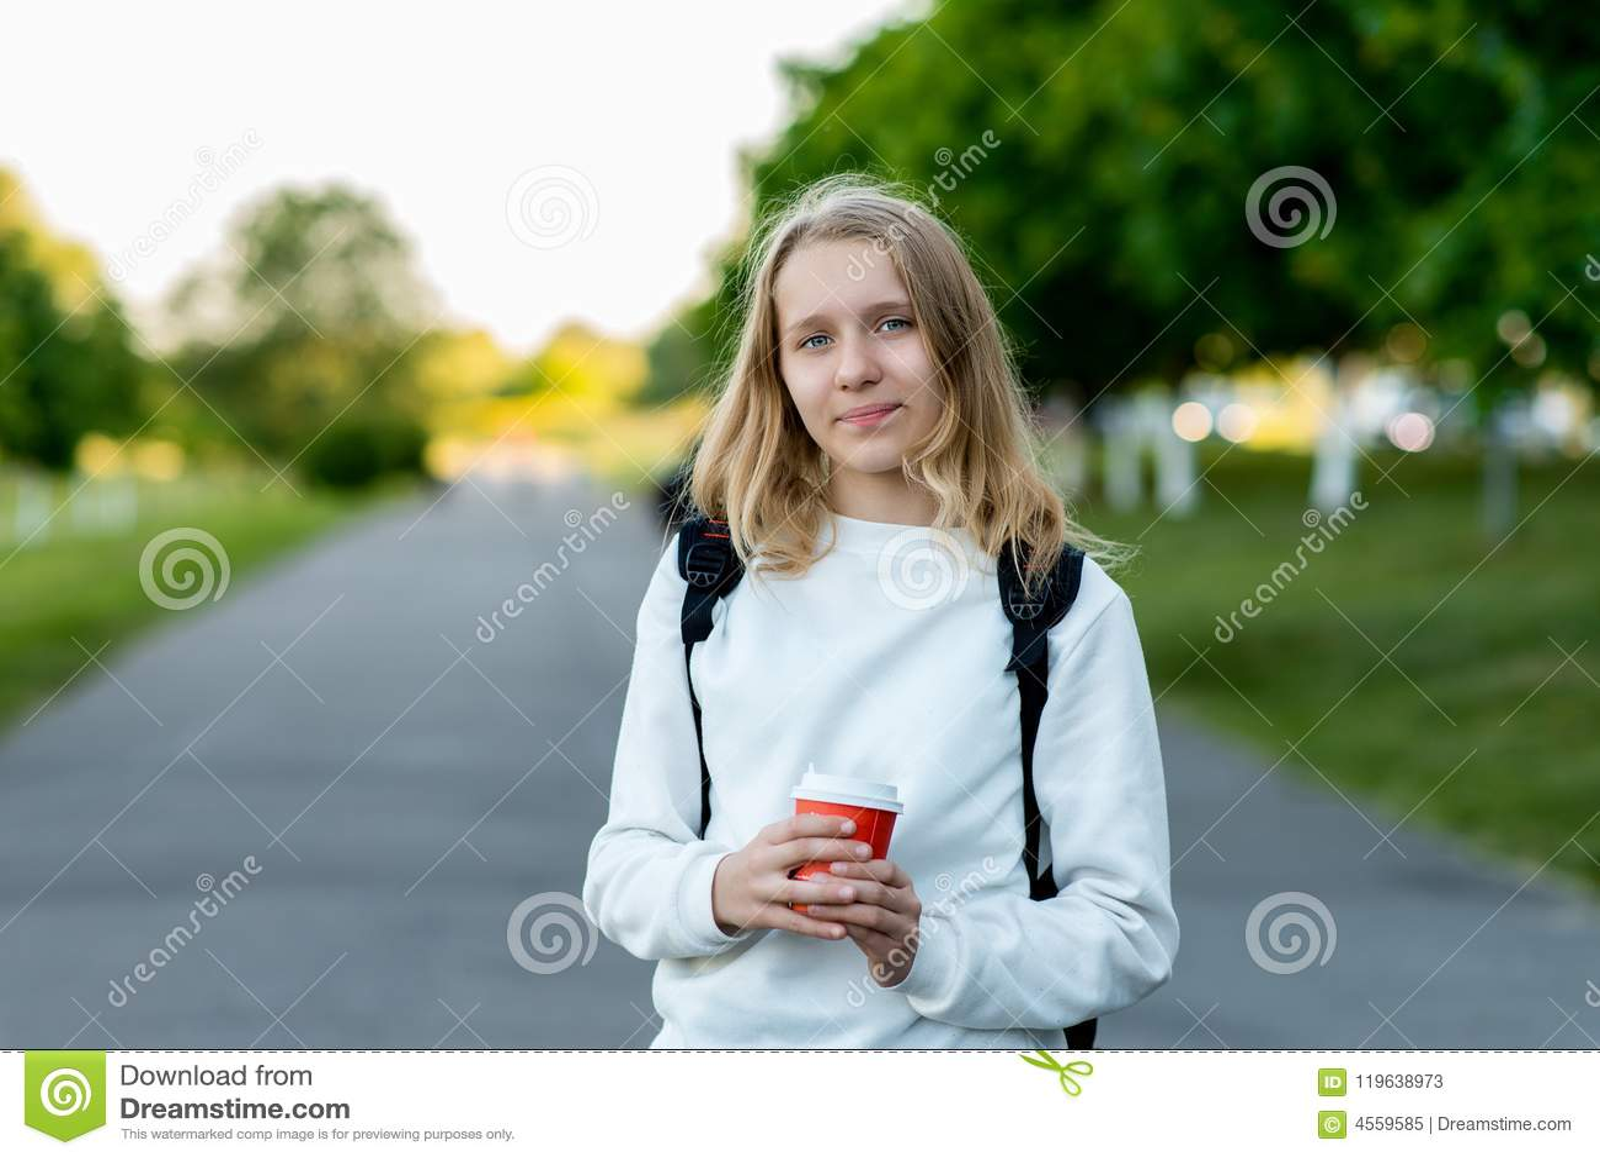 Modern schoolgirls and their problems